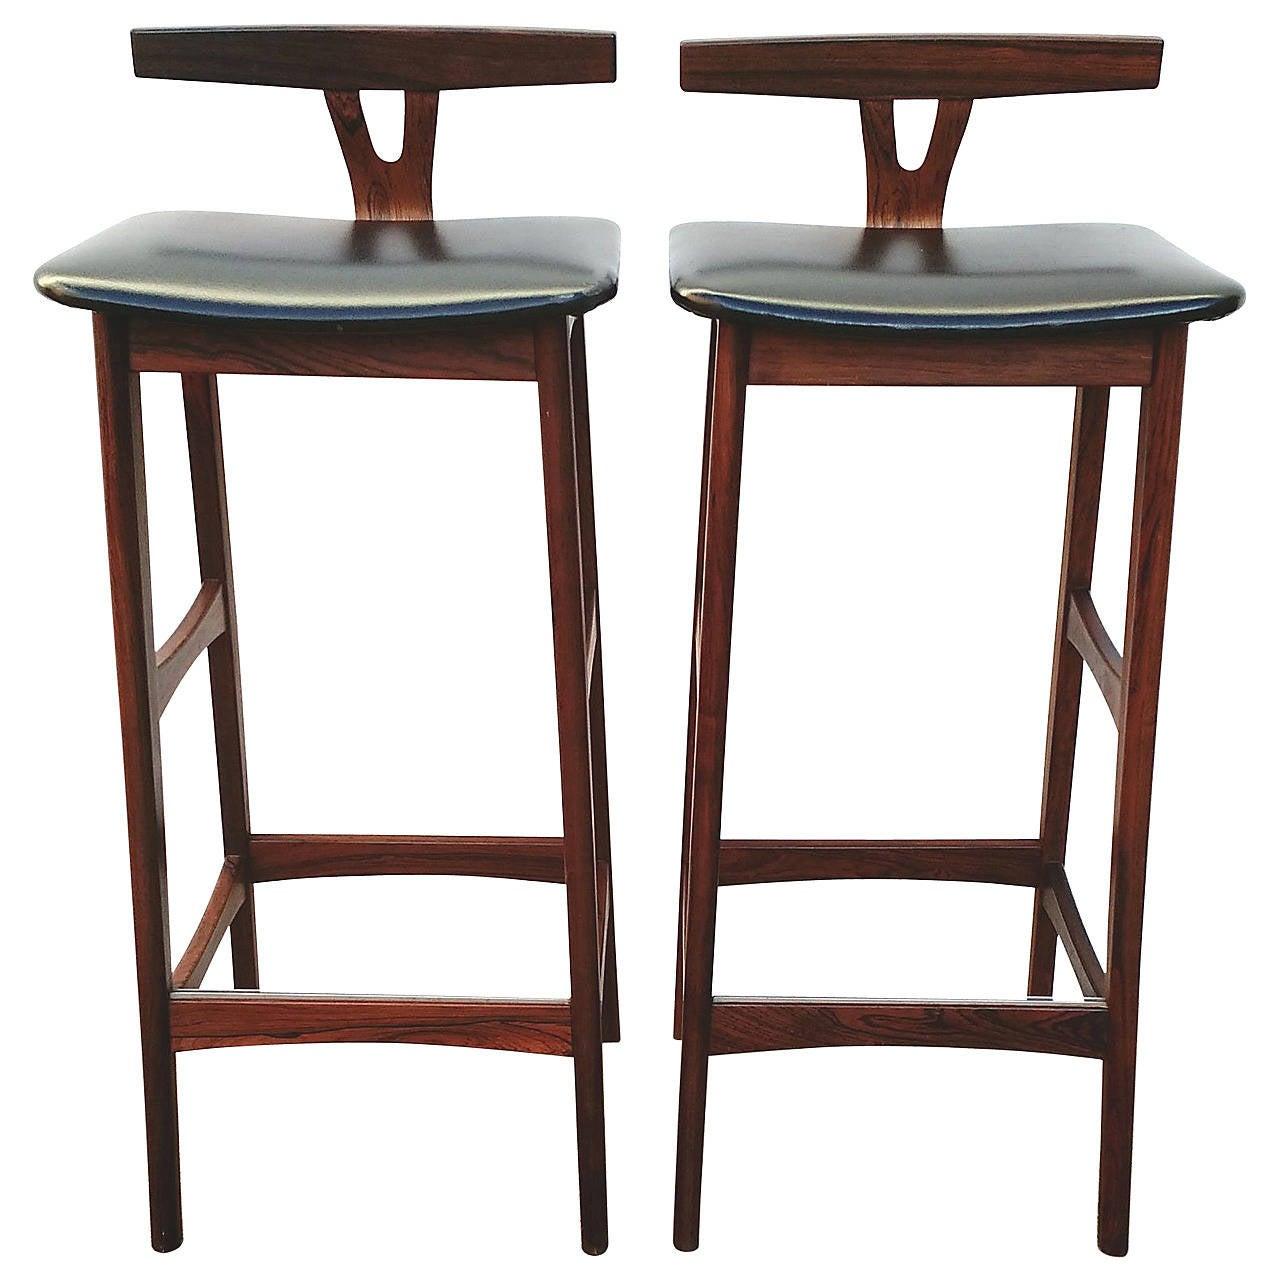 Pair of mid century danish modern rosewood bar stools by dyrlund denmark 1